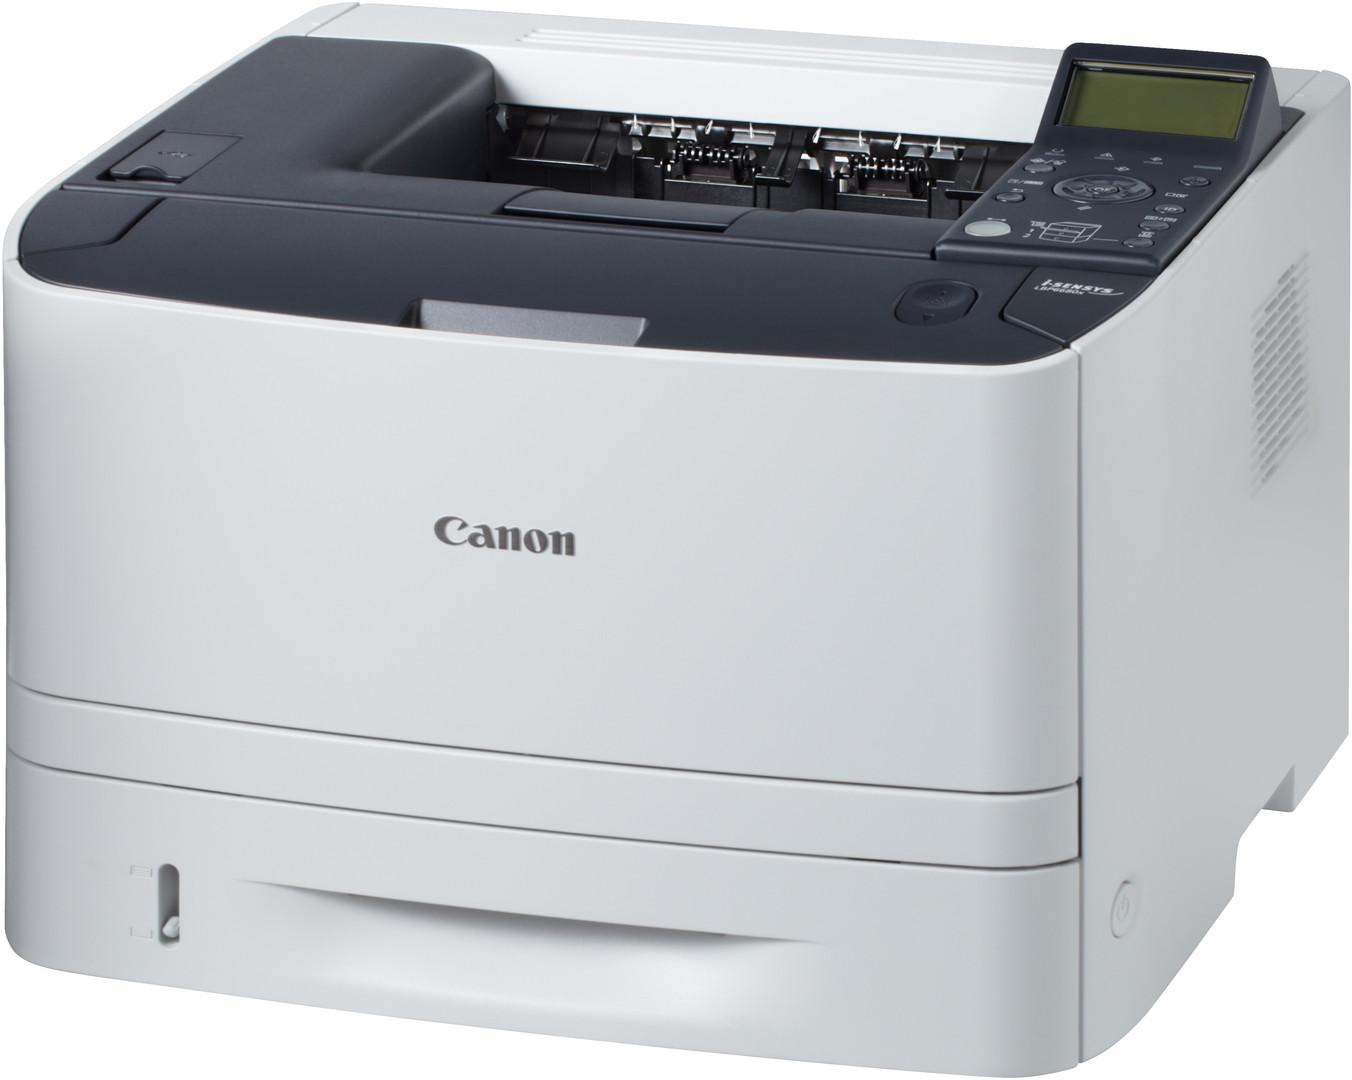 Принтер Canon i-SENSYS LBP6680x